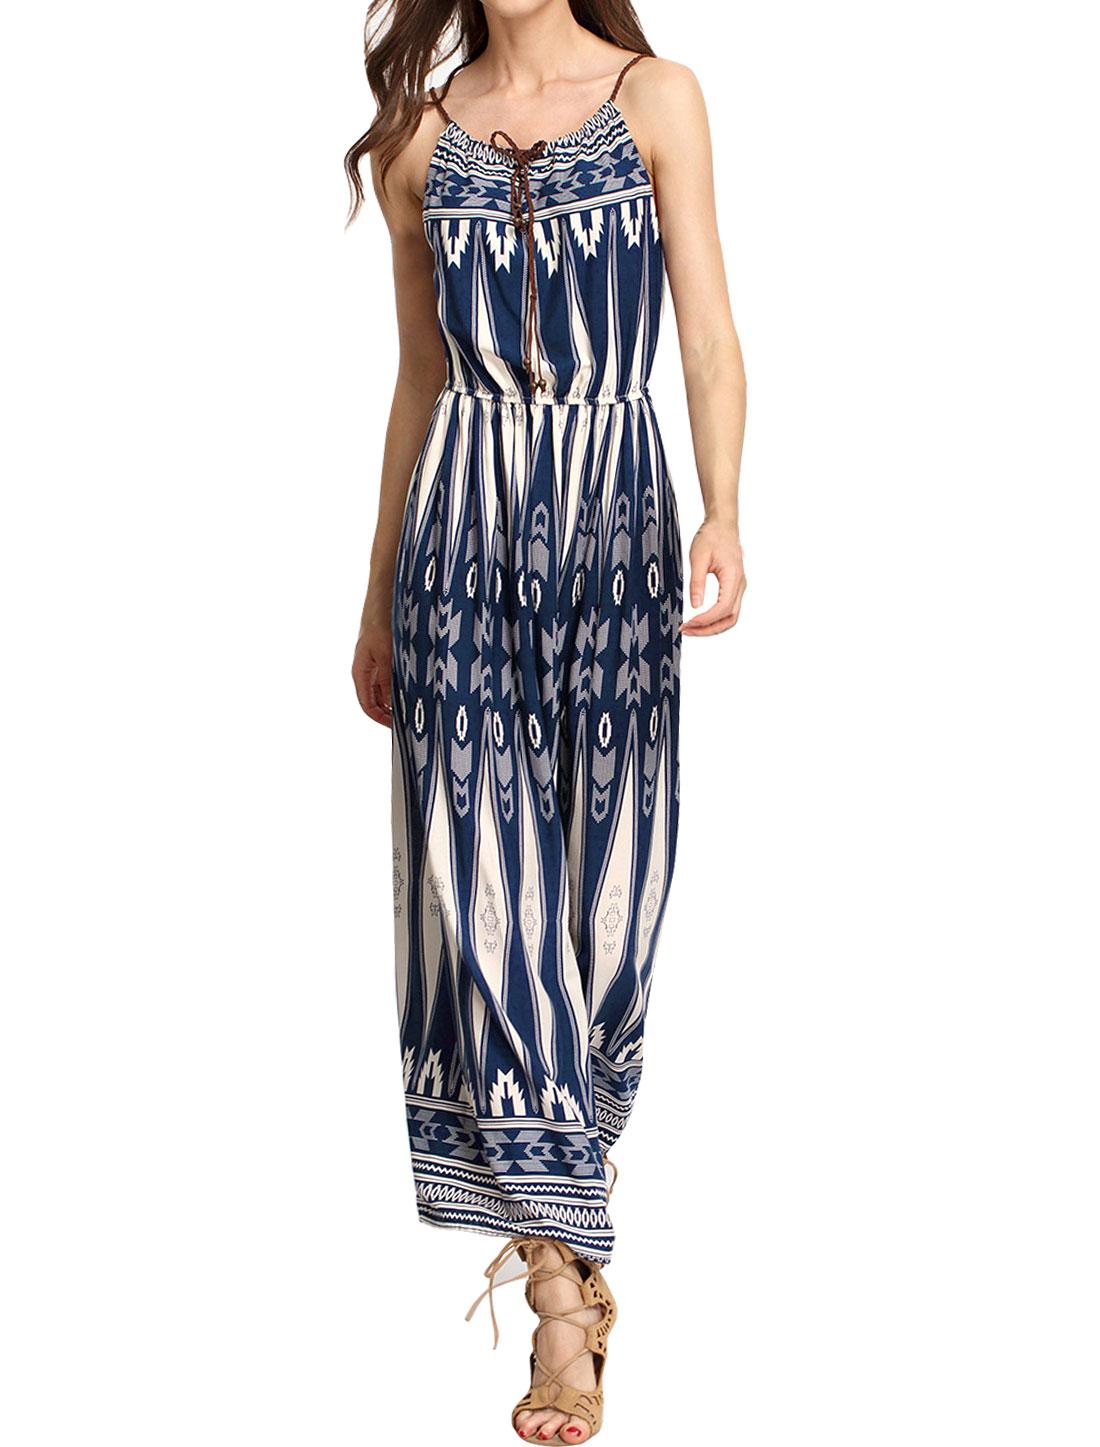 Women Novelty Prints Self Tie Neckline Sleeveless Maxi Dress Blue XS